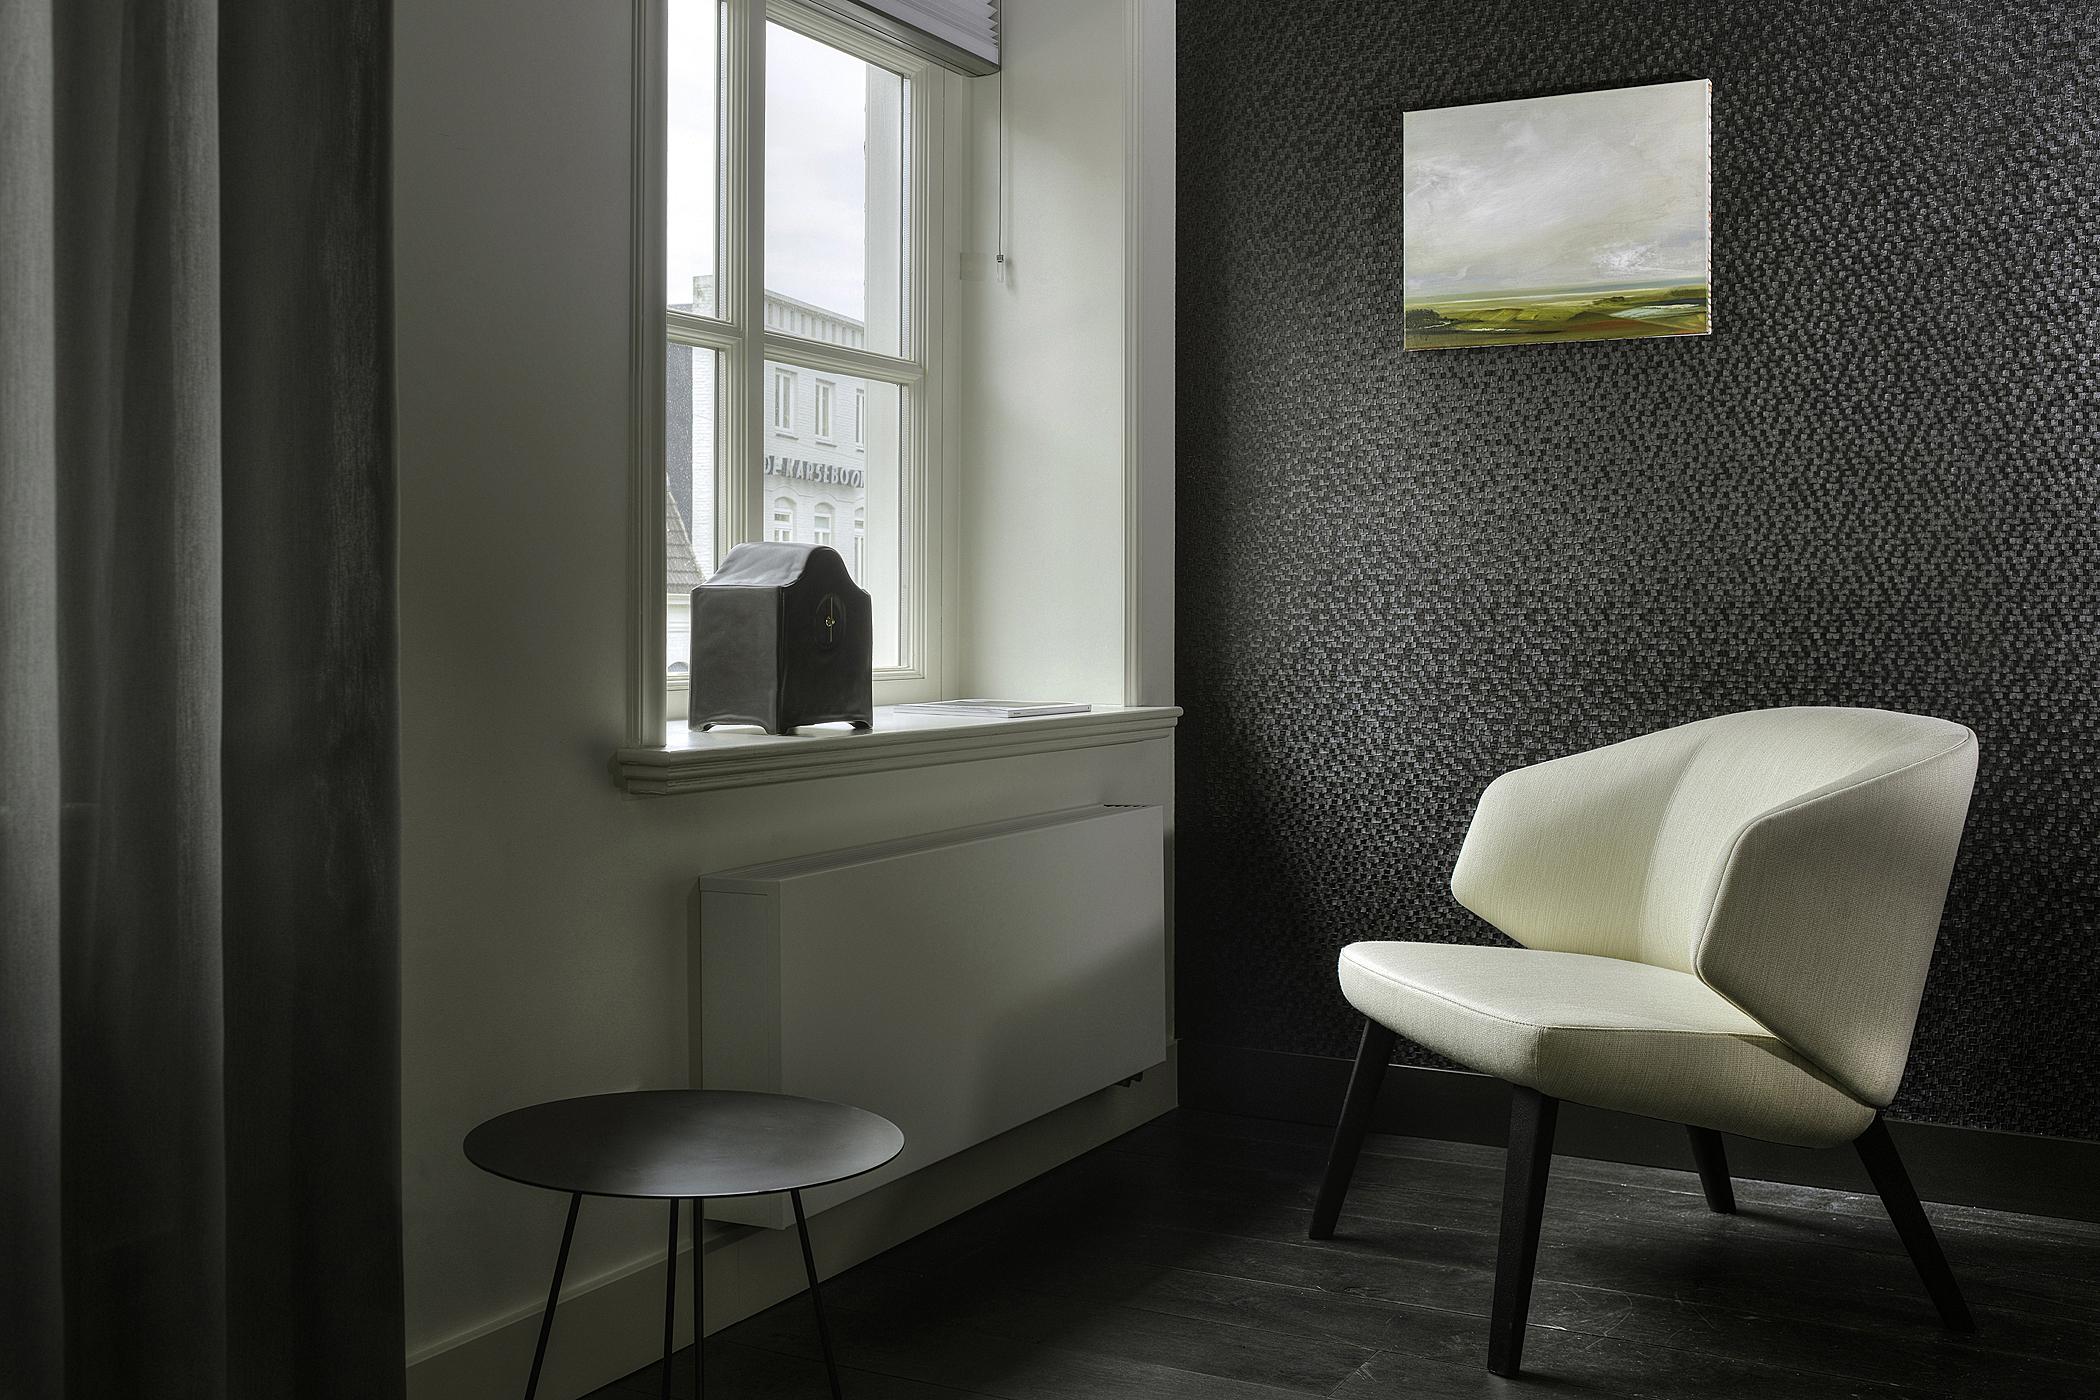 Kazerne Charming Room Chair Image Patrick Meis